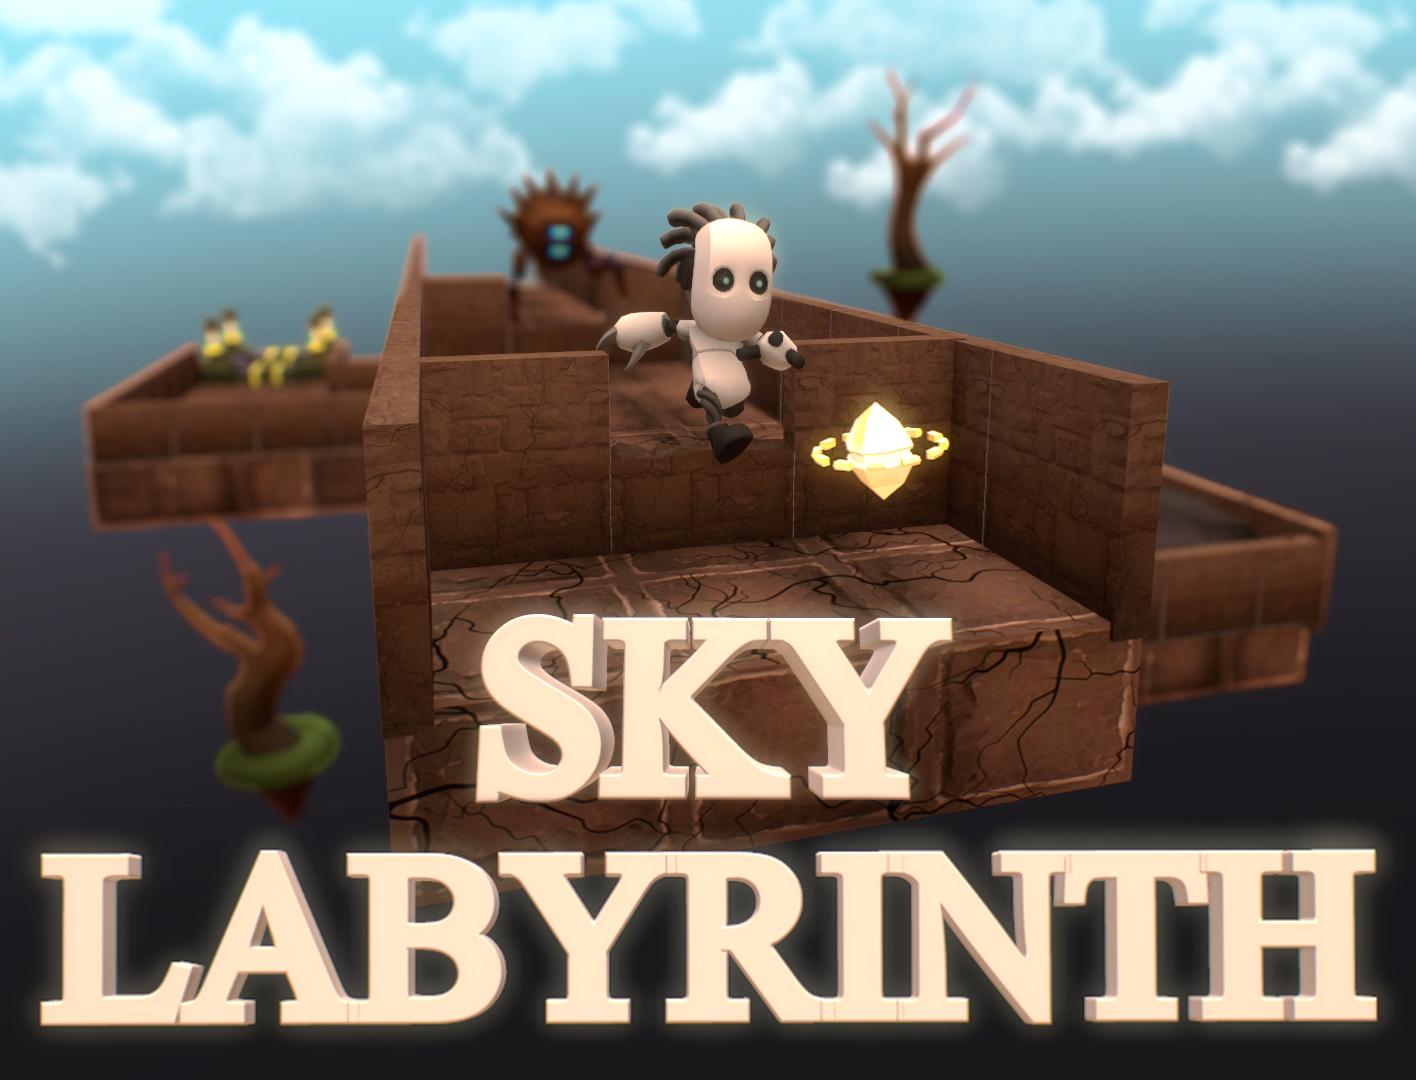 Sky Labyrinth